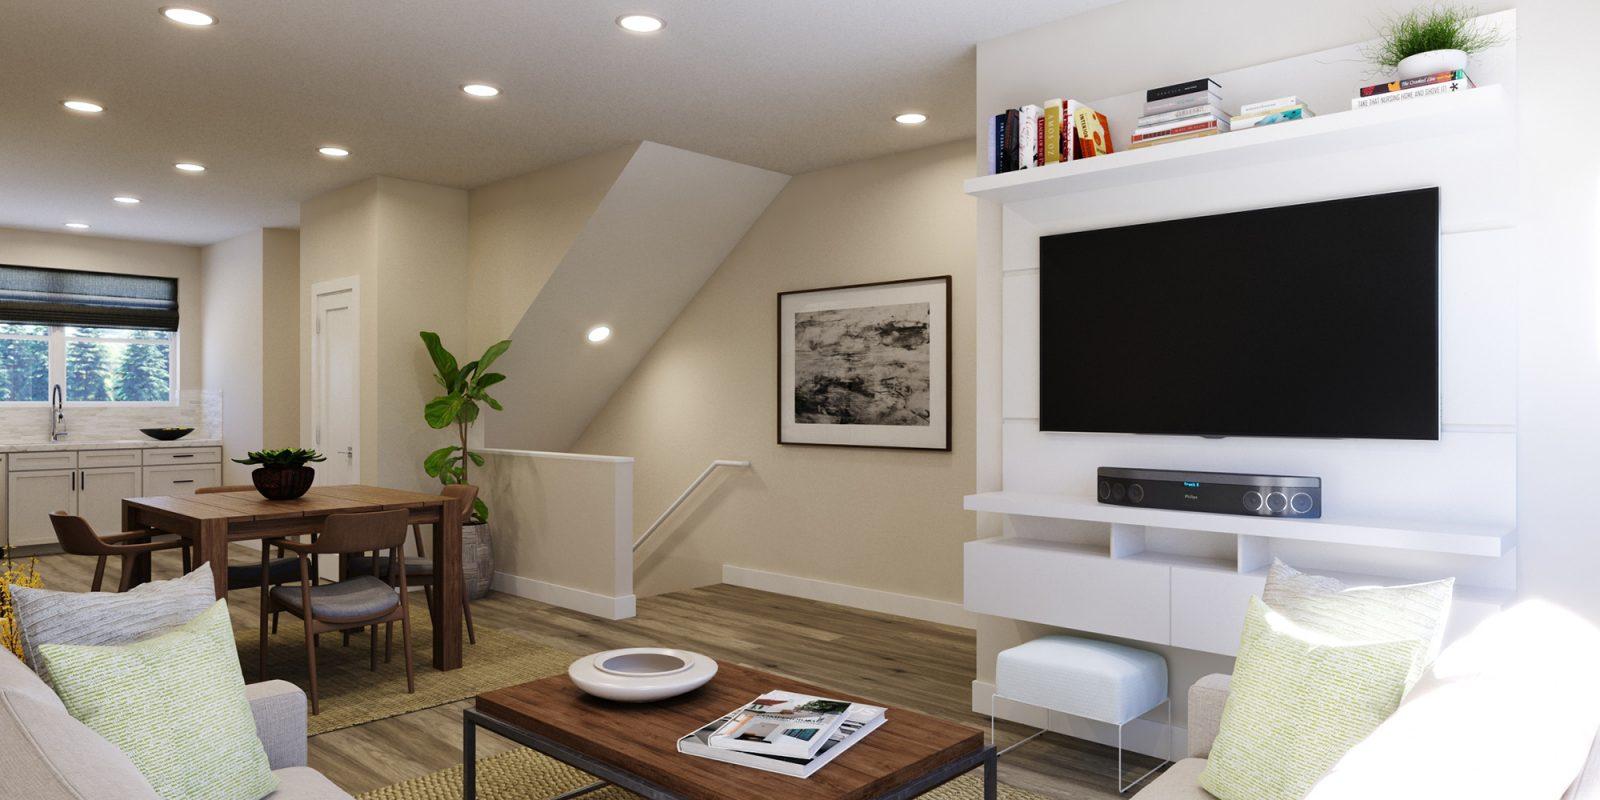 Baseline DoMore Rows: Escape - Living Room